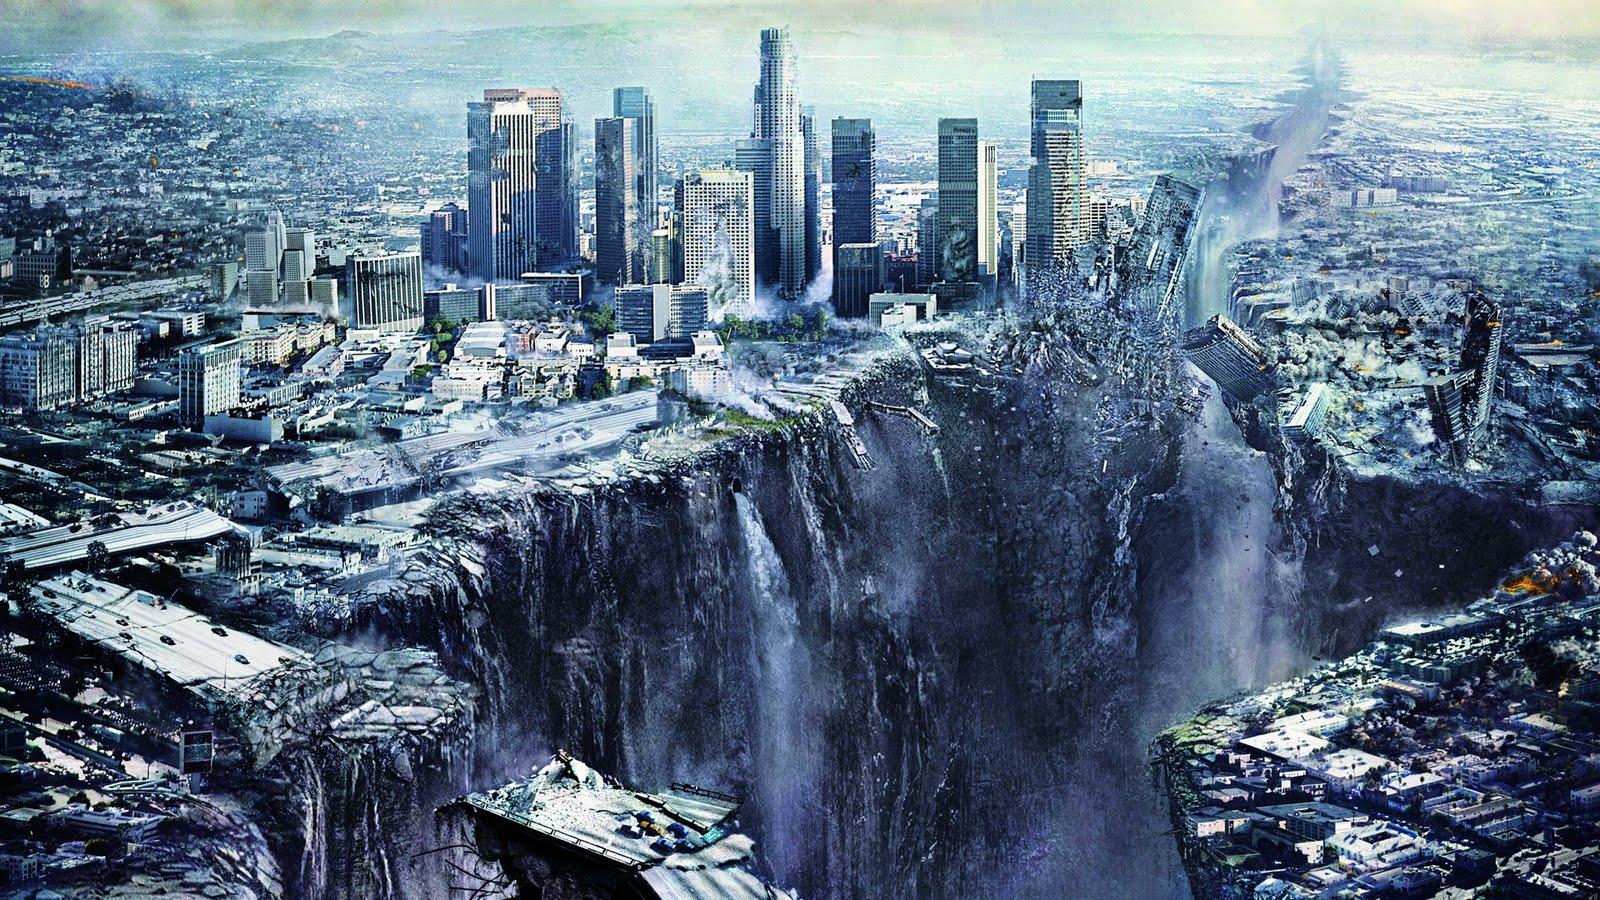 temblor-de-tierra-apocalipsis-biblia